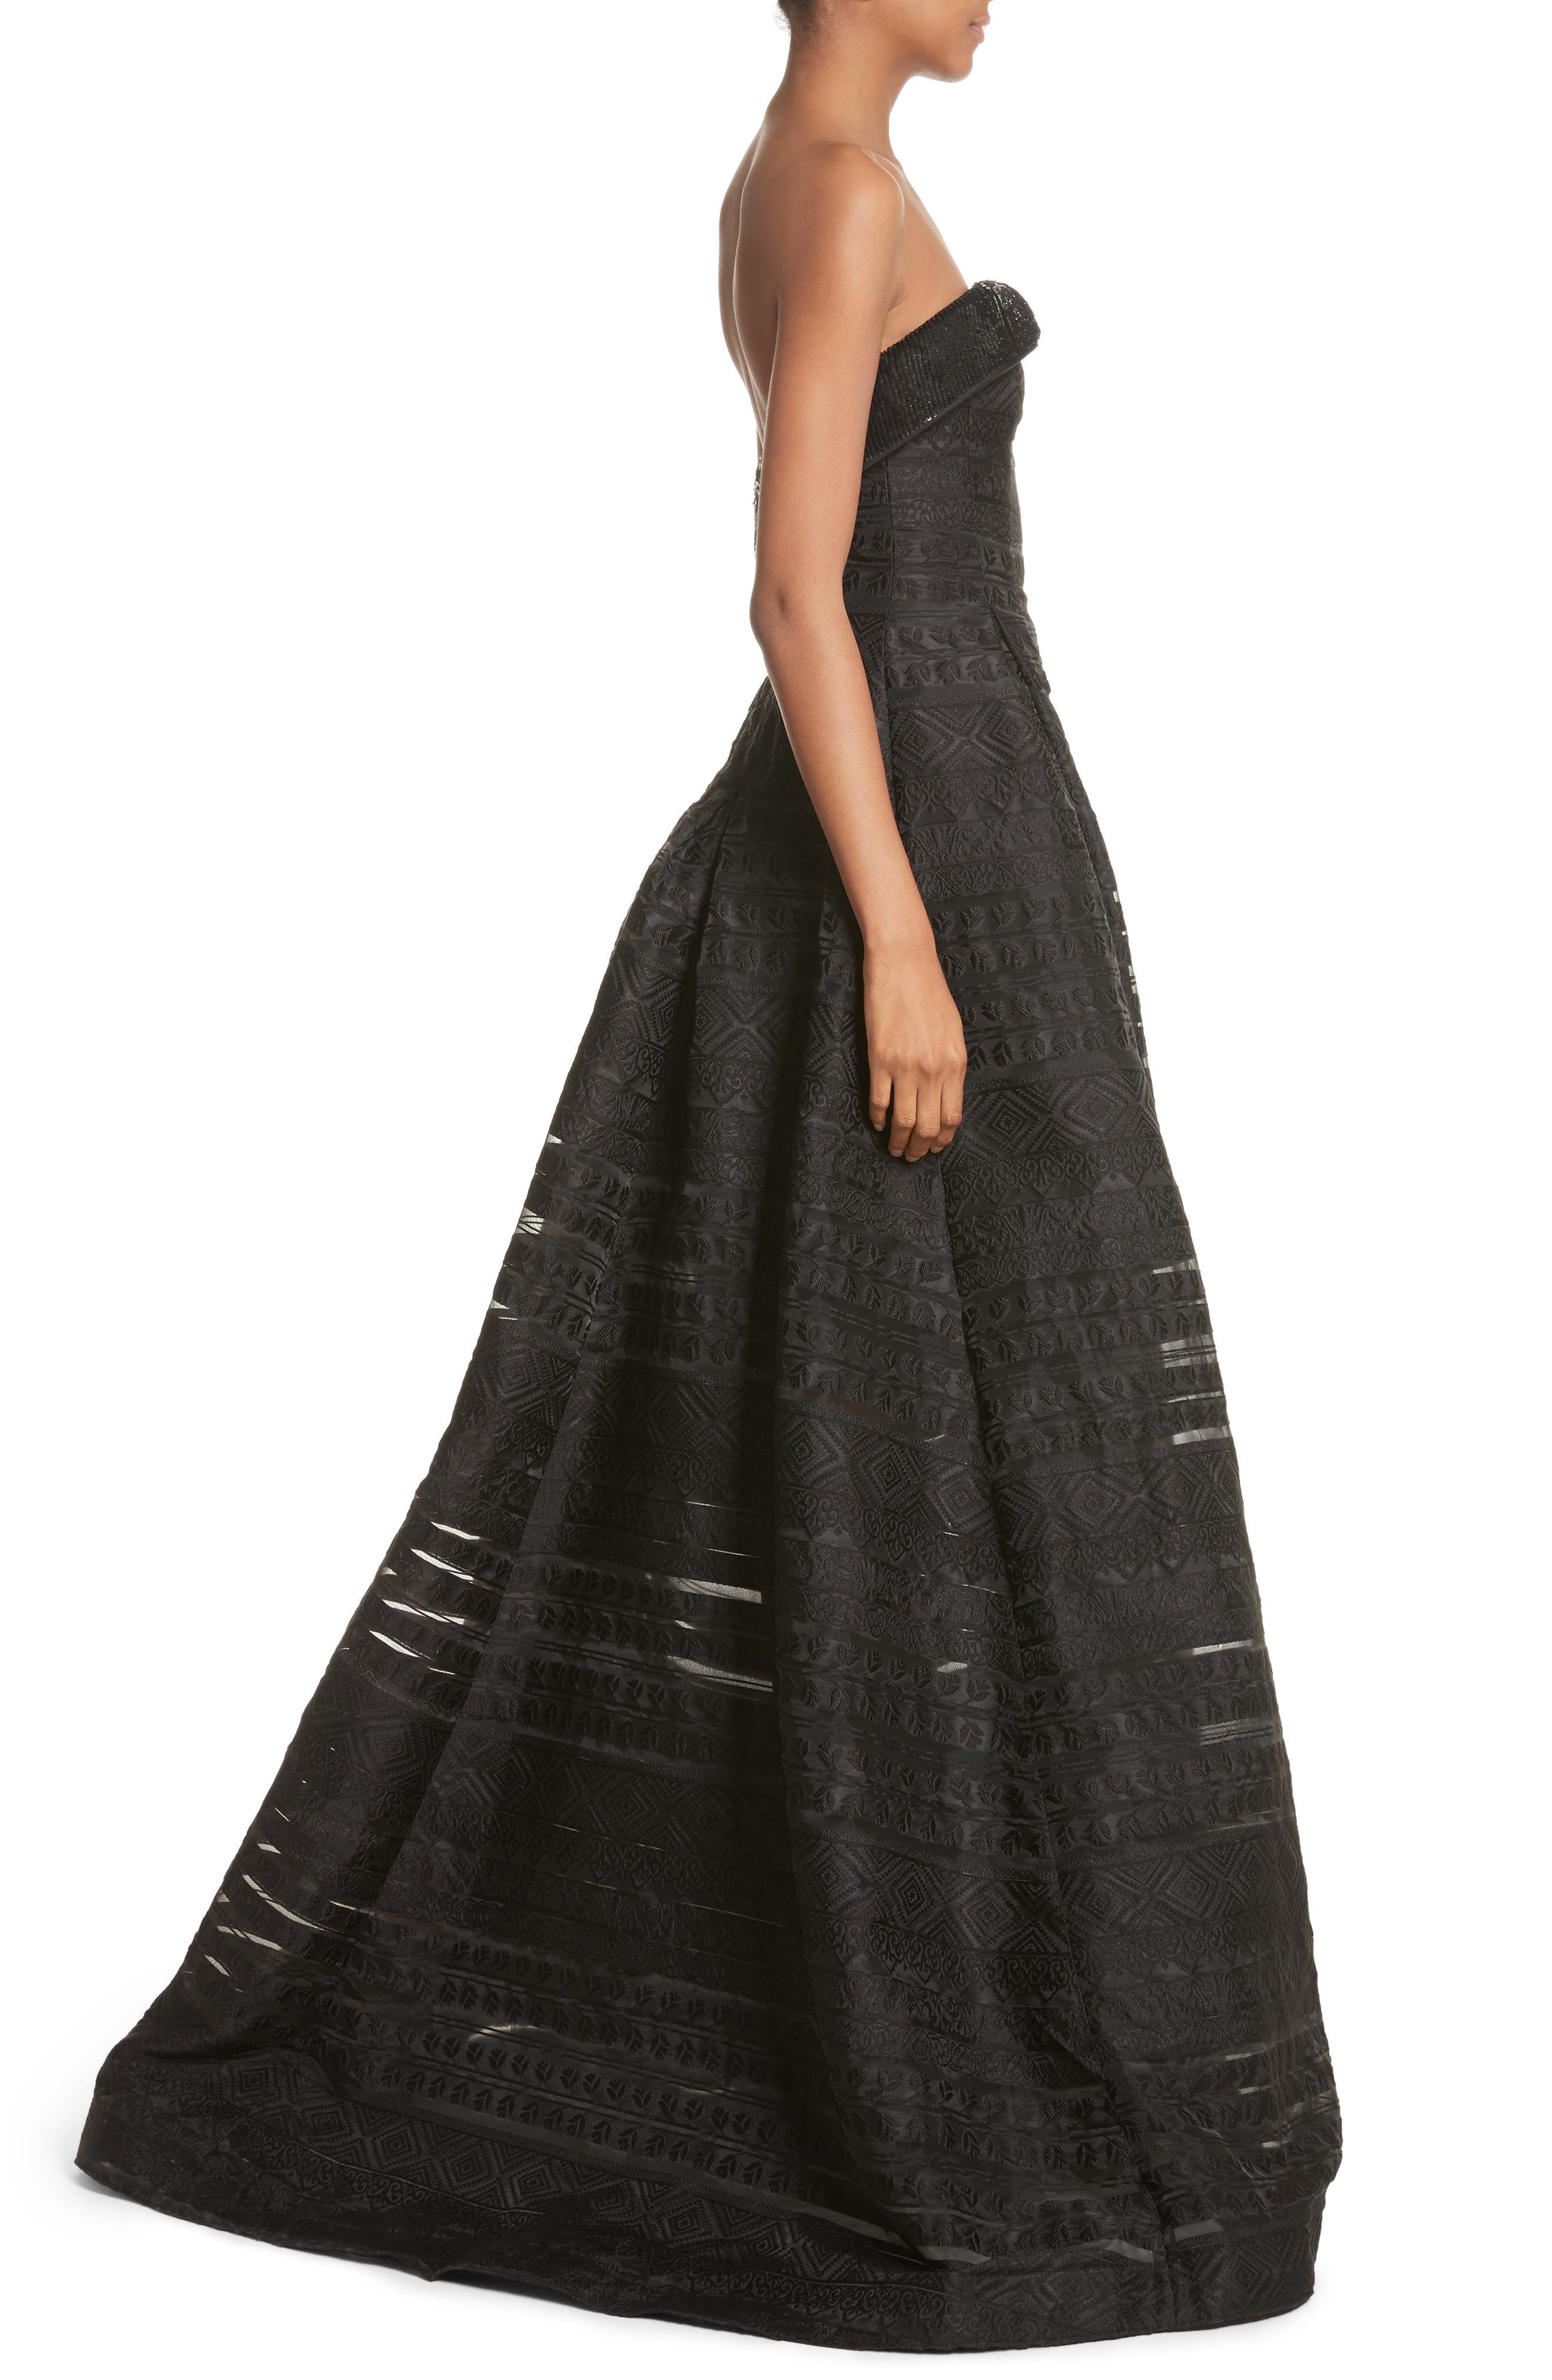 Noir Istiklal Embellished Strapless Ballgown,                             Alternate thumbnail 3, color,                             001